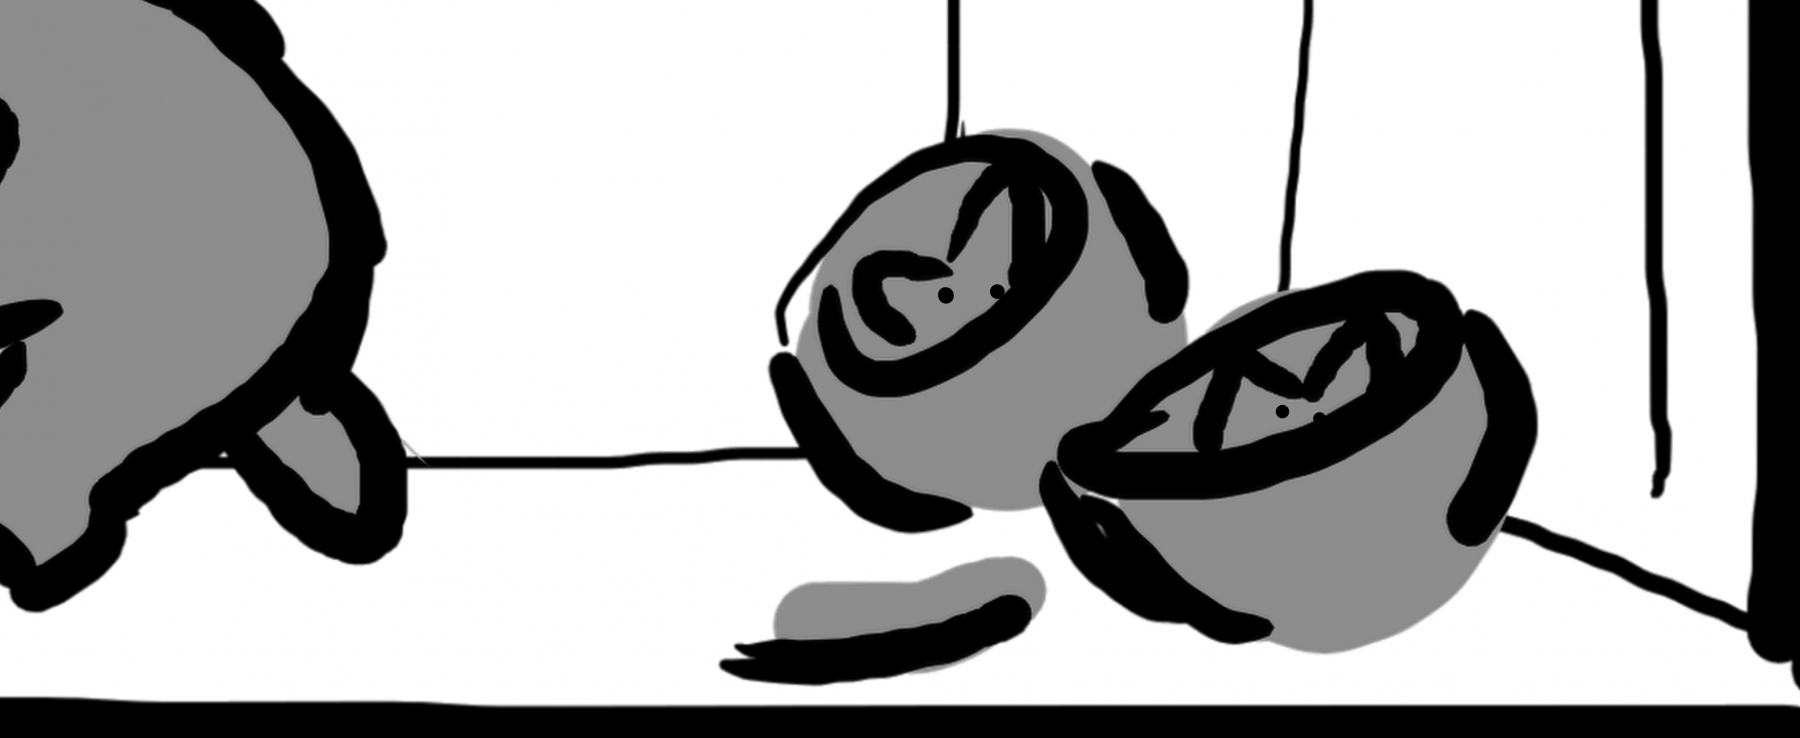 Nut-Thumbnail-Rough-Board00388